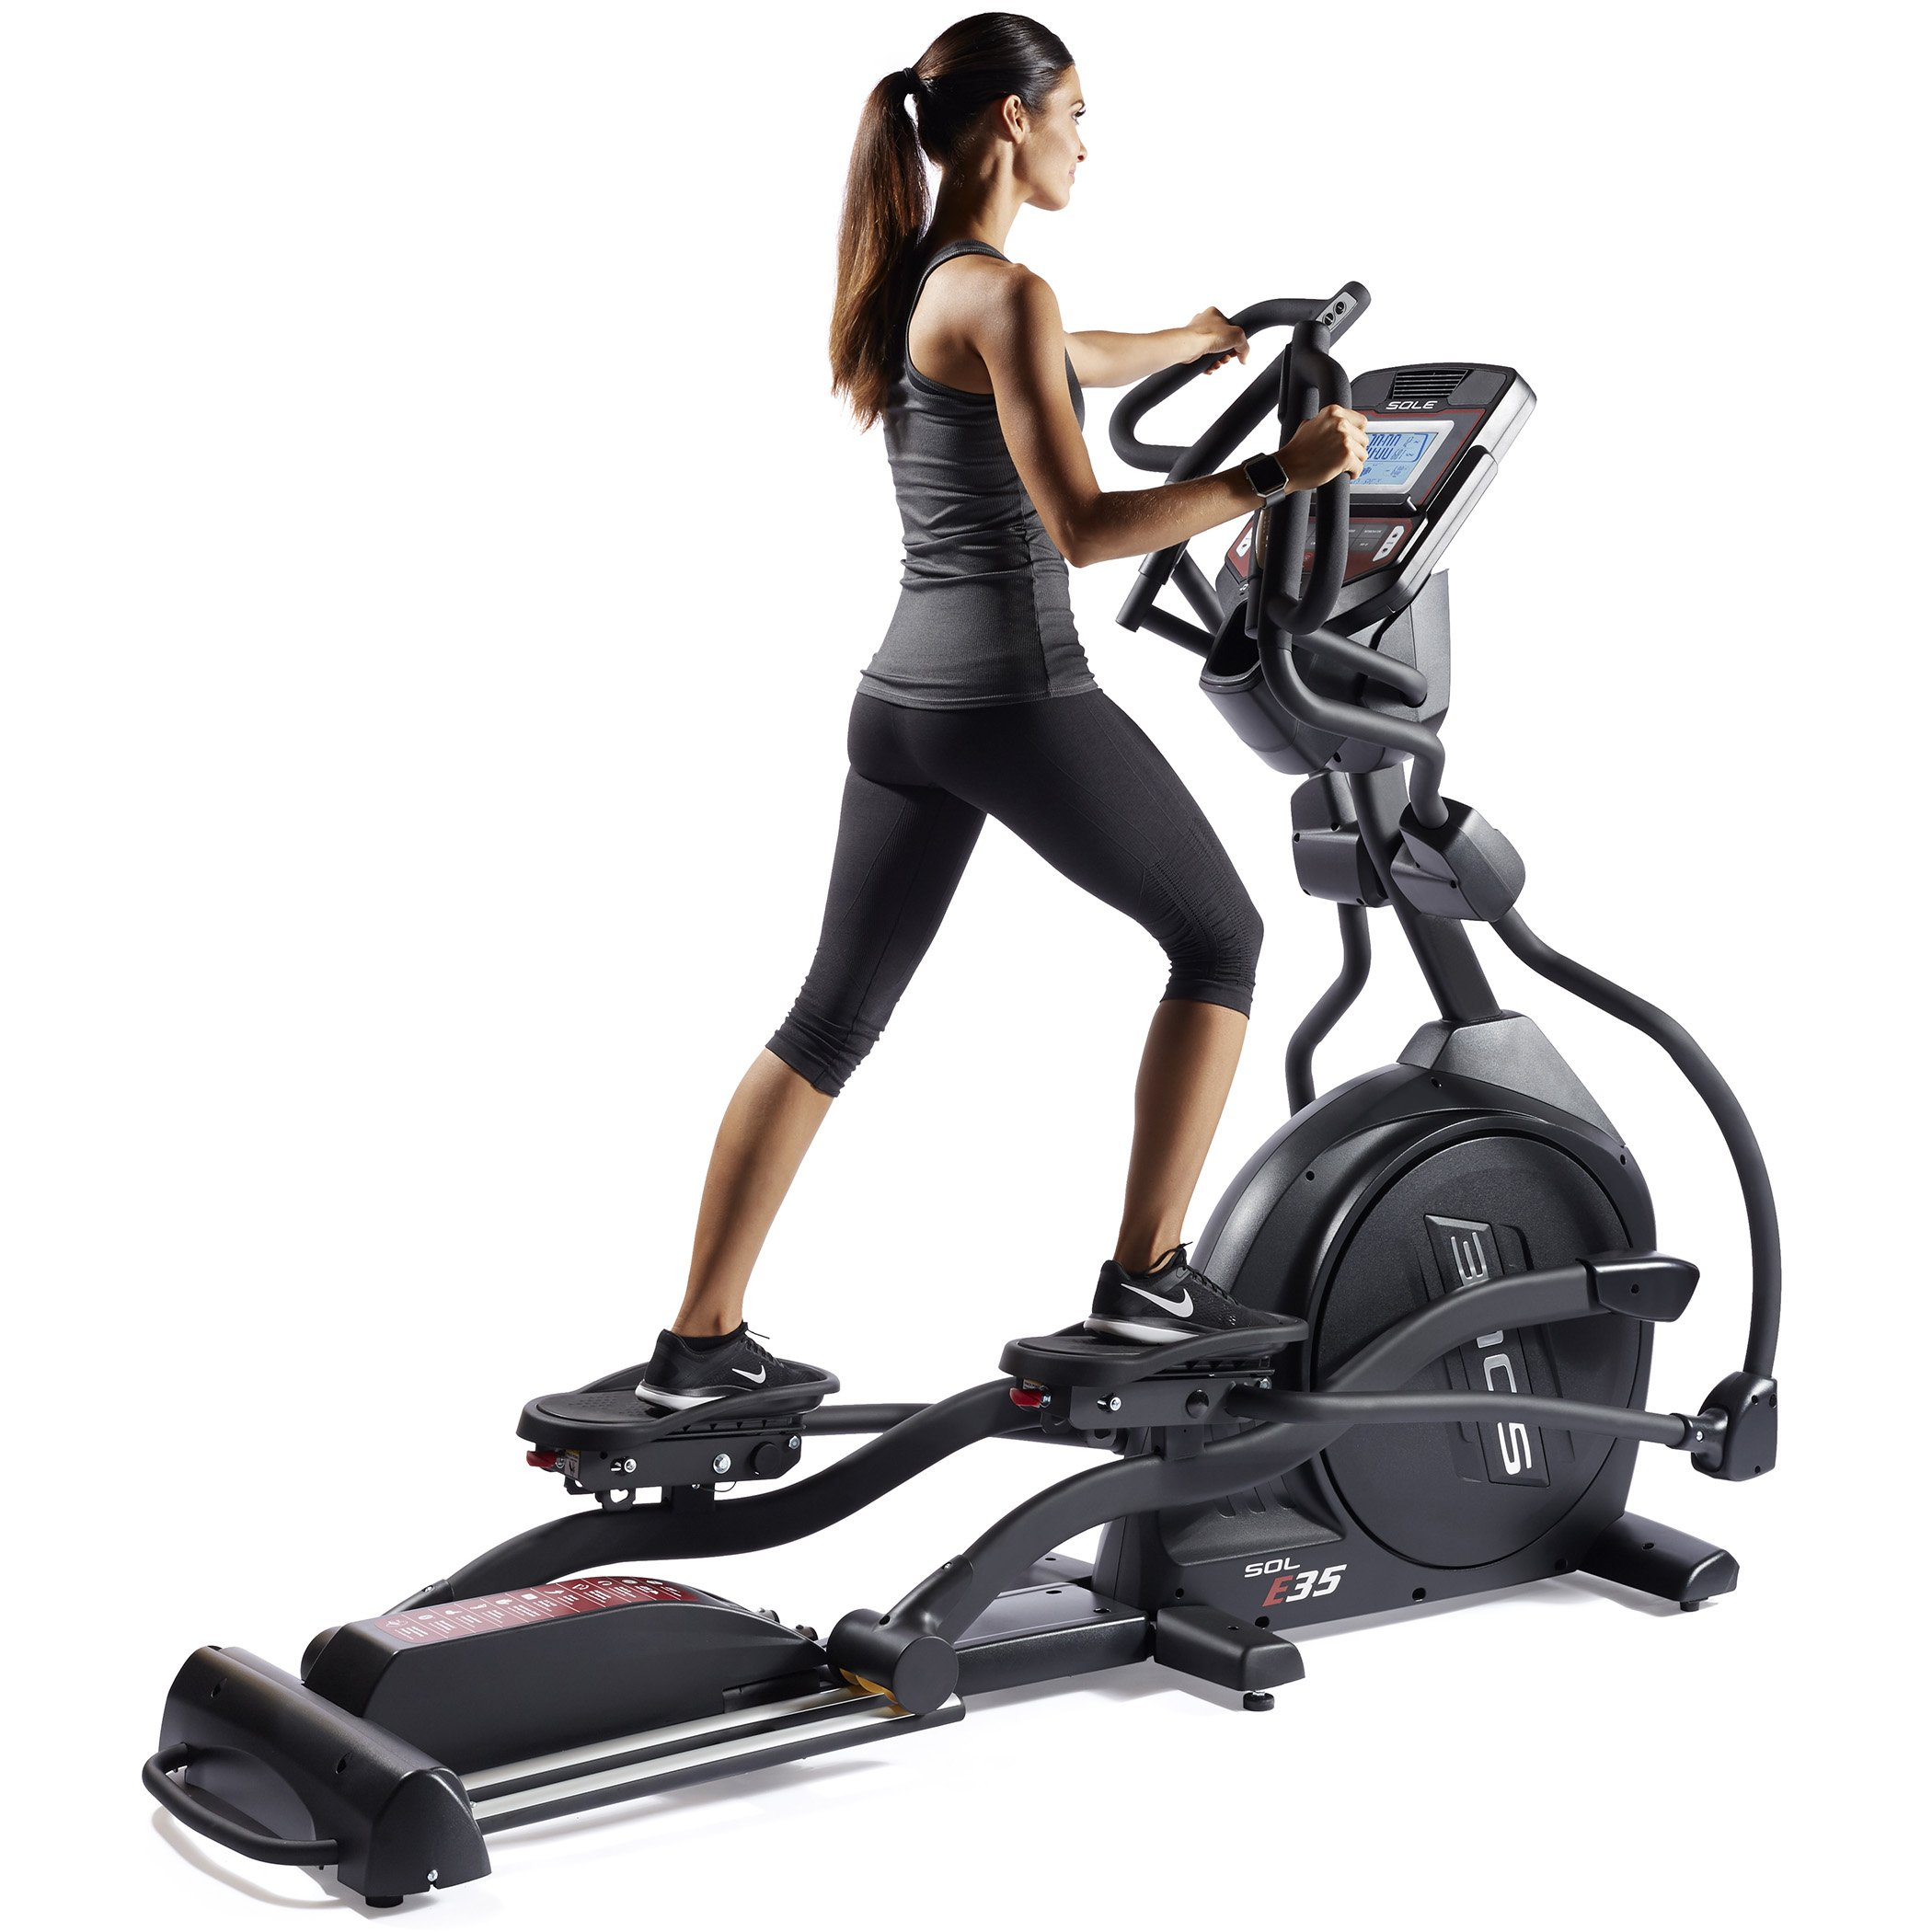 Sole Fitness E35 Elliptical Machine by SOLE